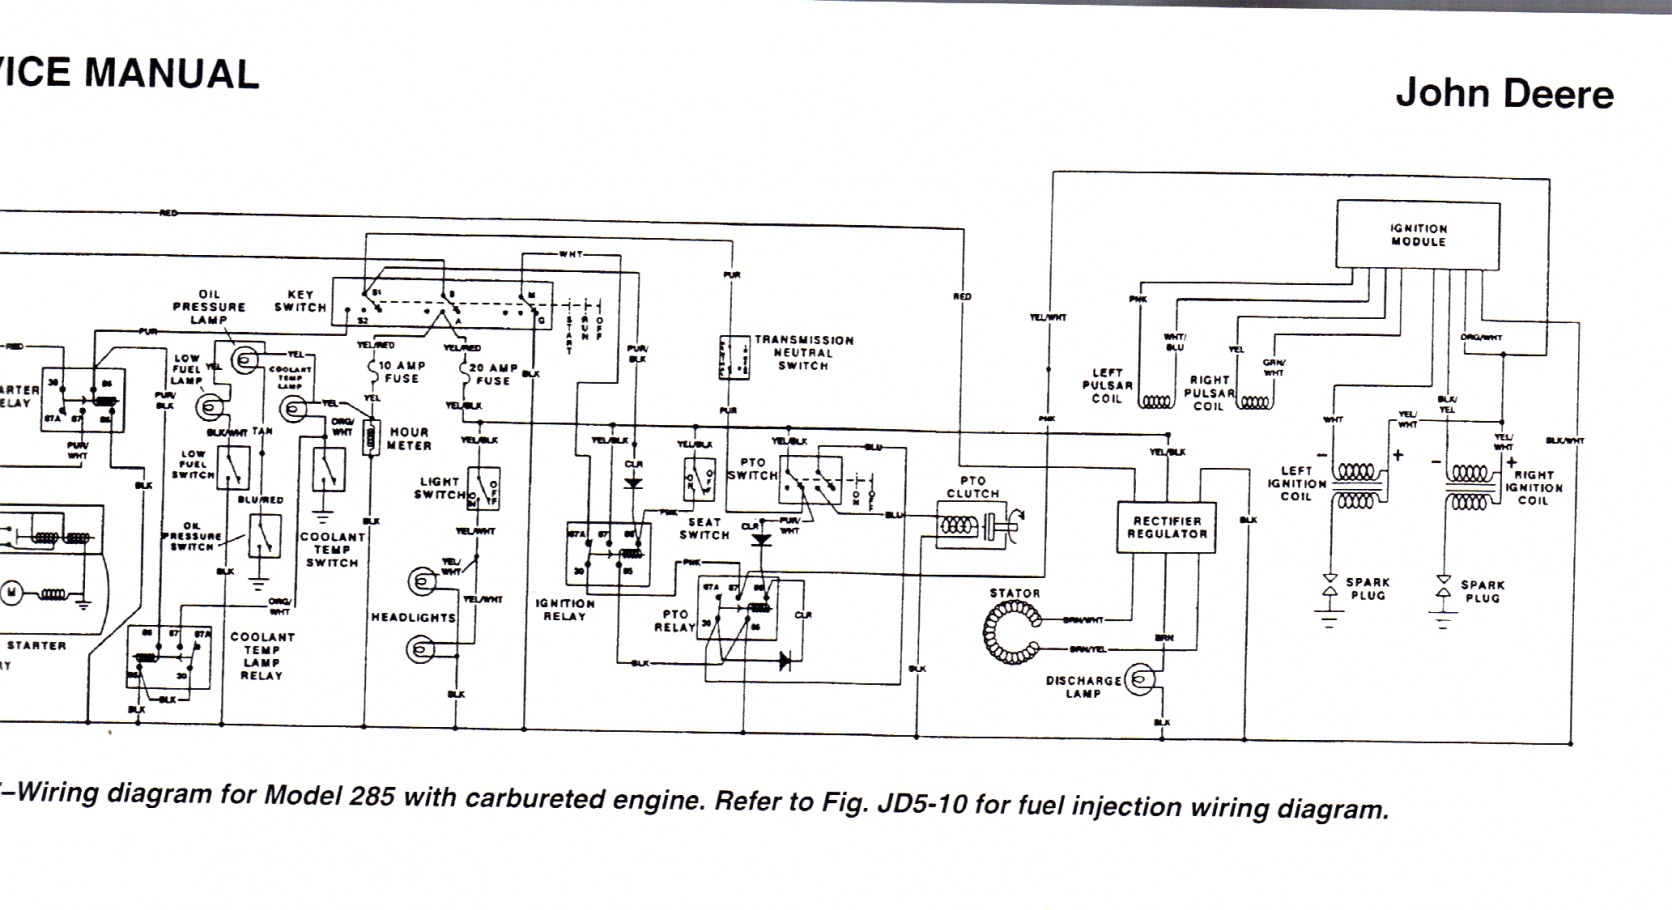 John Deere Fuse Box | Wiring Diagram - John Deere Wiring Diagram